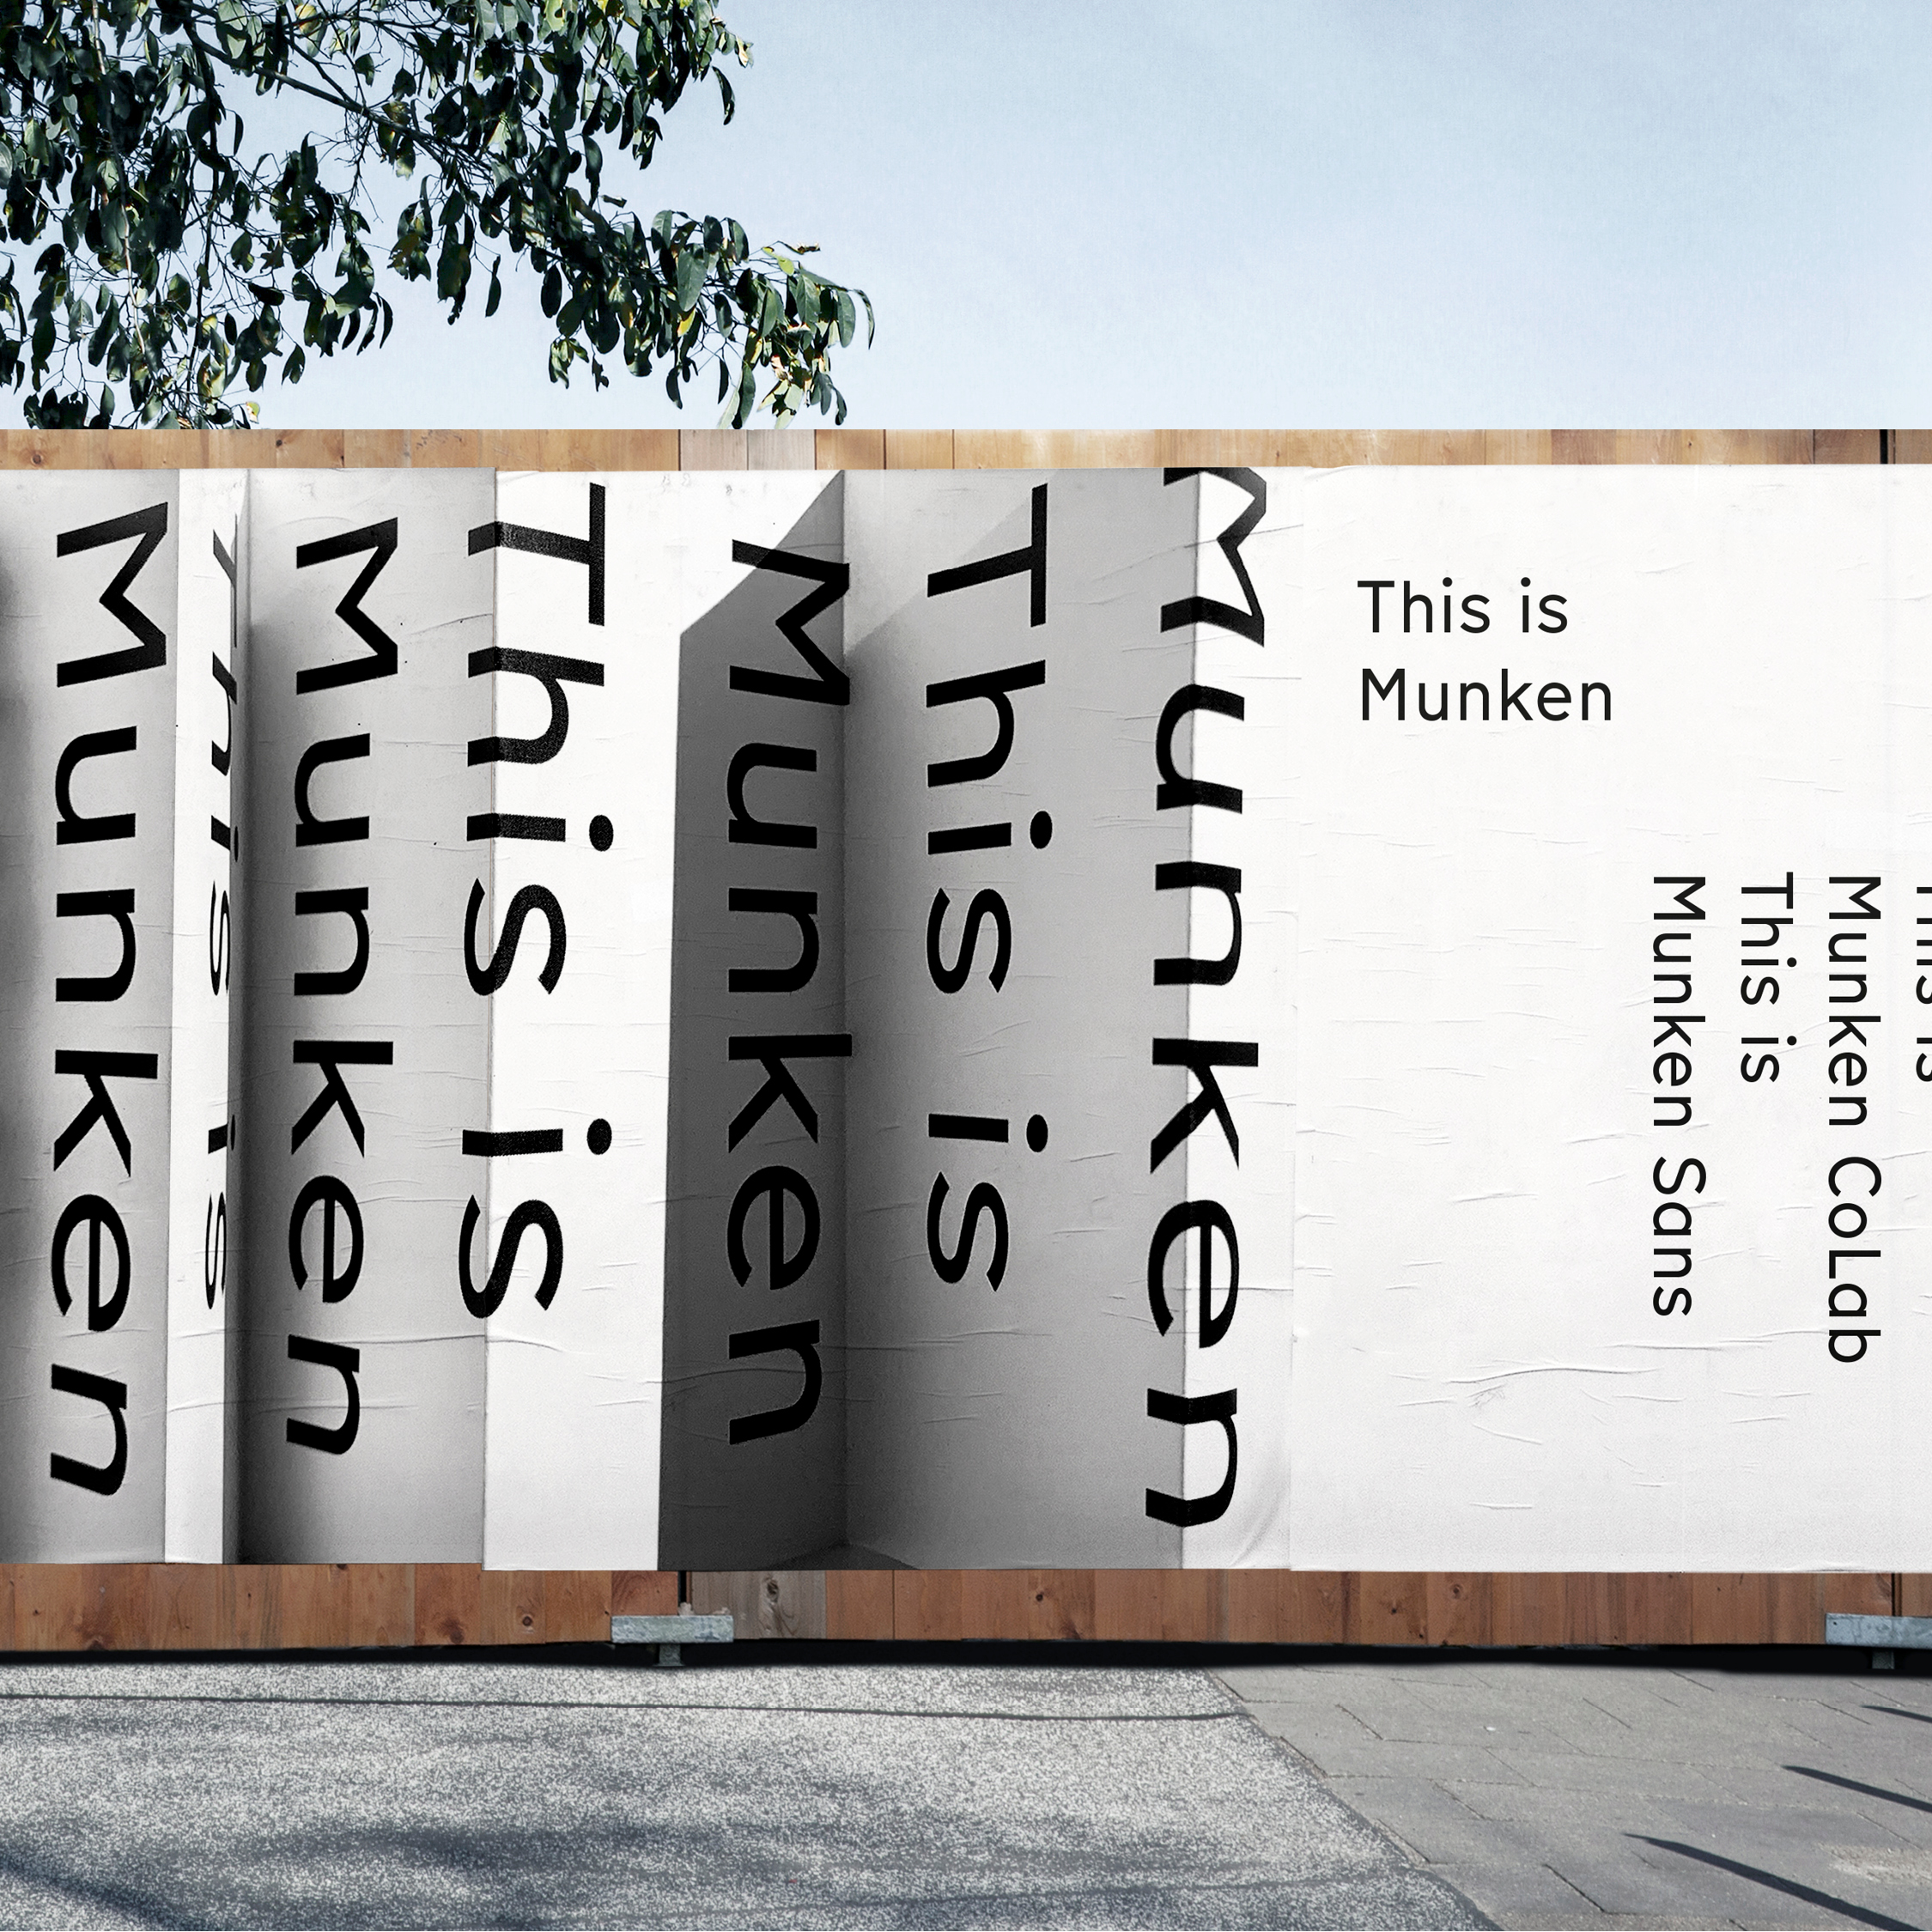 Munken_Rebranding_poster_wall